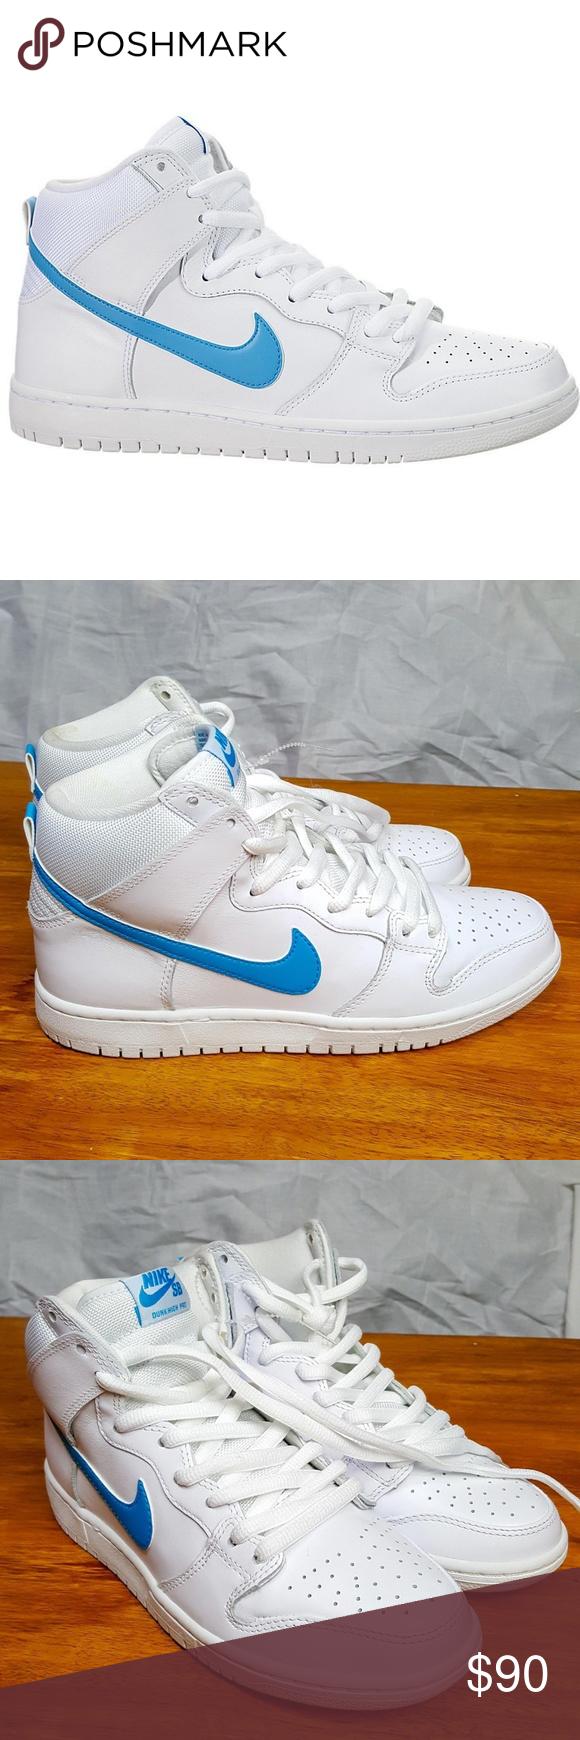 separation shoes c24ed bb957 Nike SB Dunk High TRD QS Richard Mulder 881758-141 Nike SB Dunk High TRD